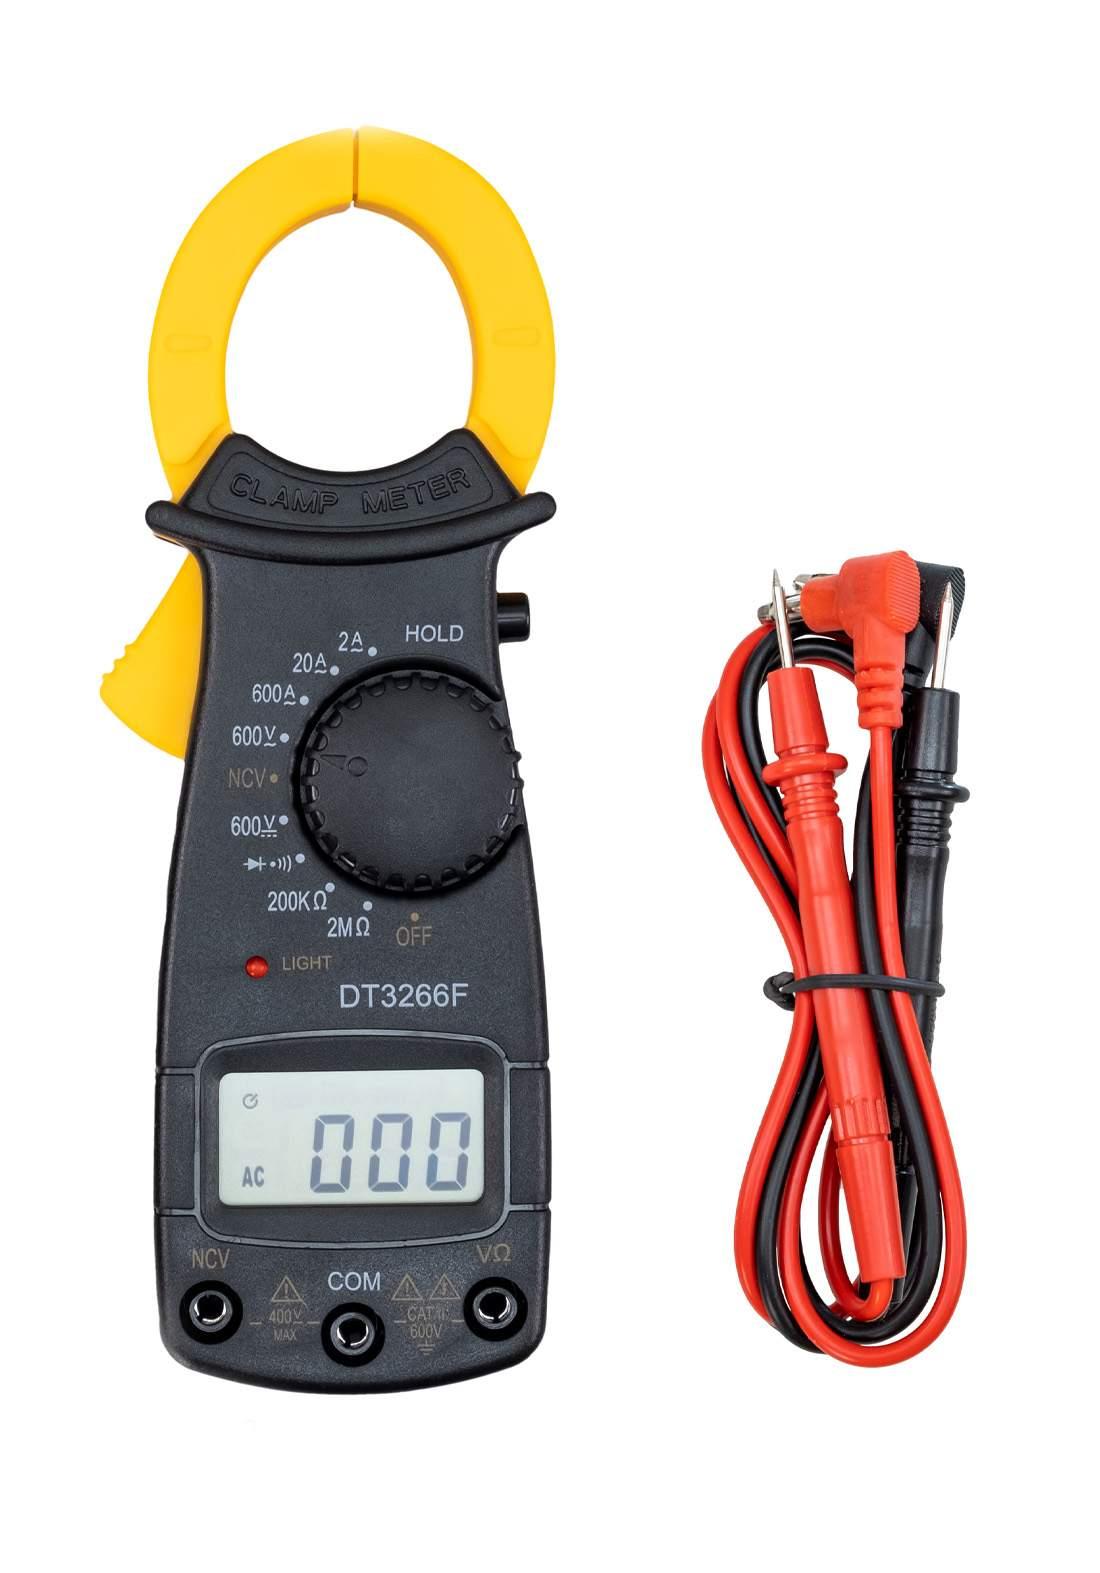 Clampmeter DT3266F 600 A 600 V جهاز قياس